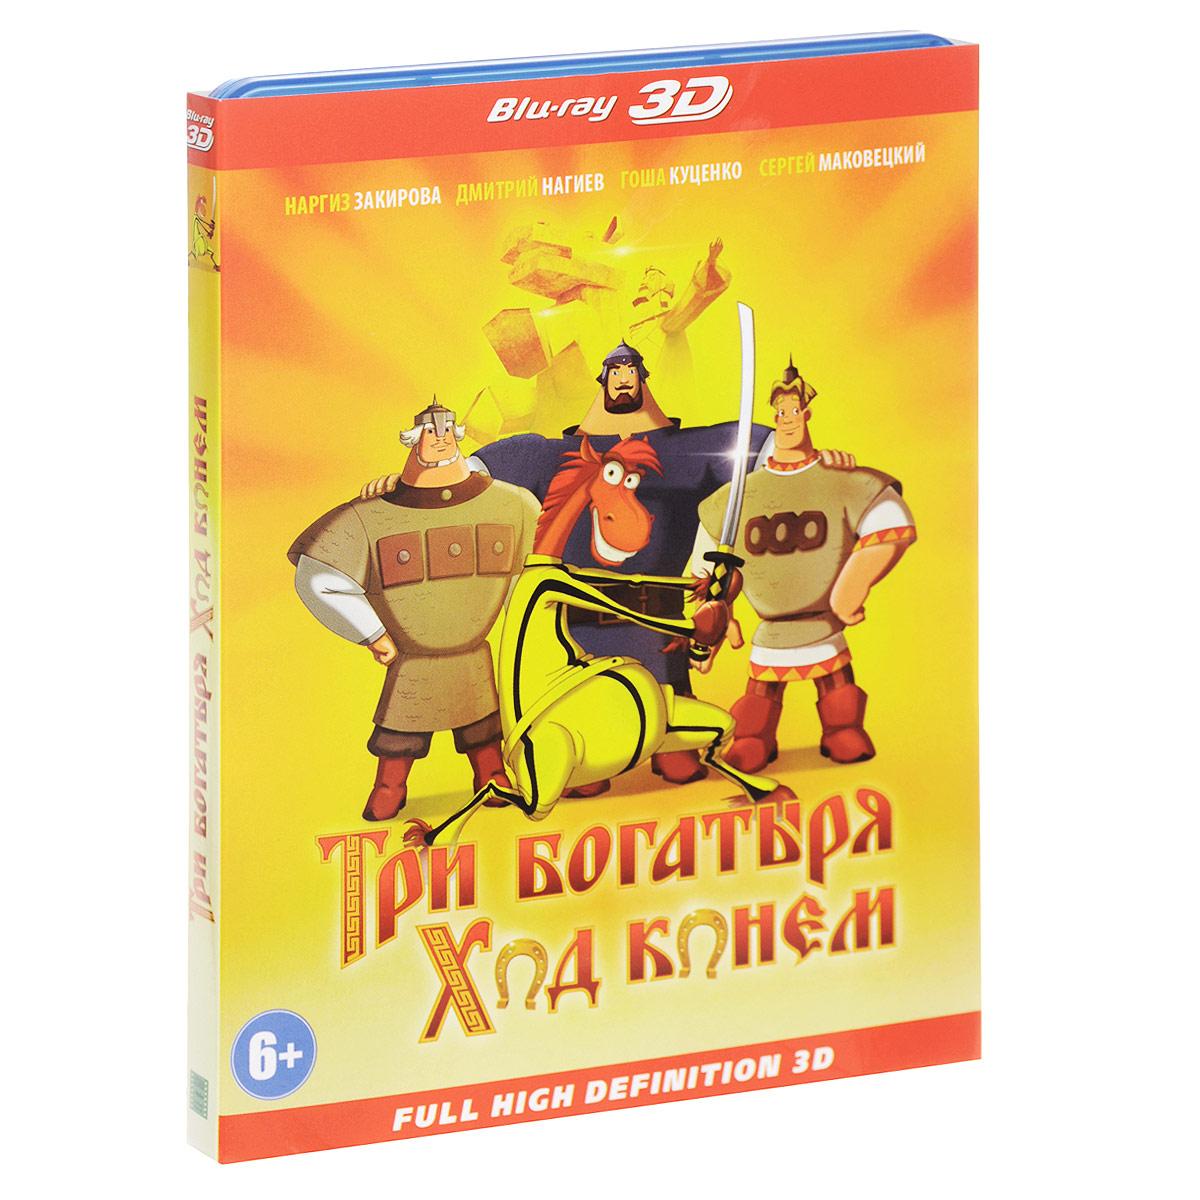 Три богатыря: Ход конем 3D (Blu-ray) великий диктатор blu ray